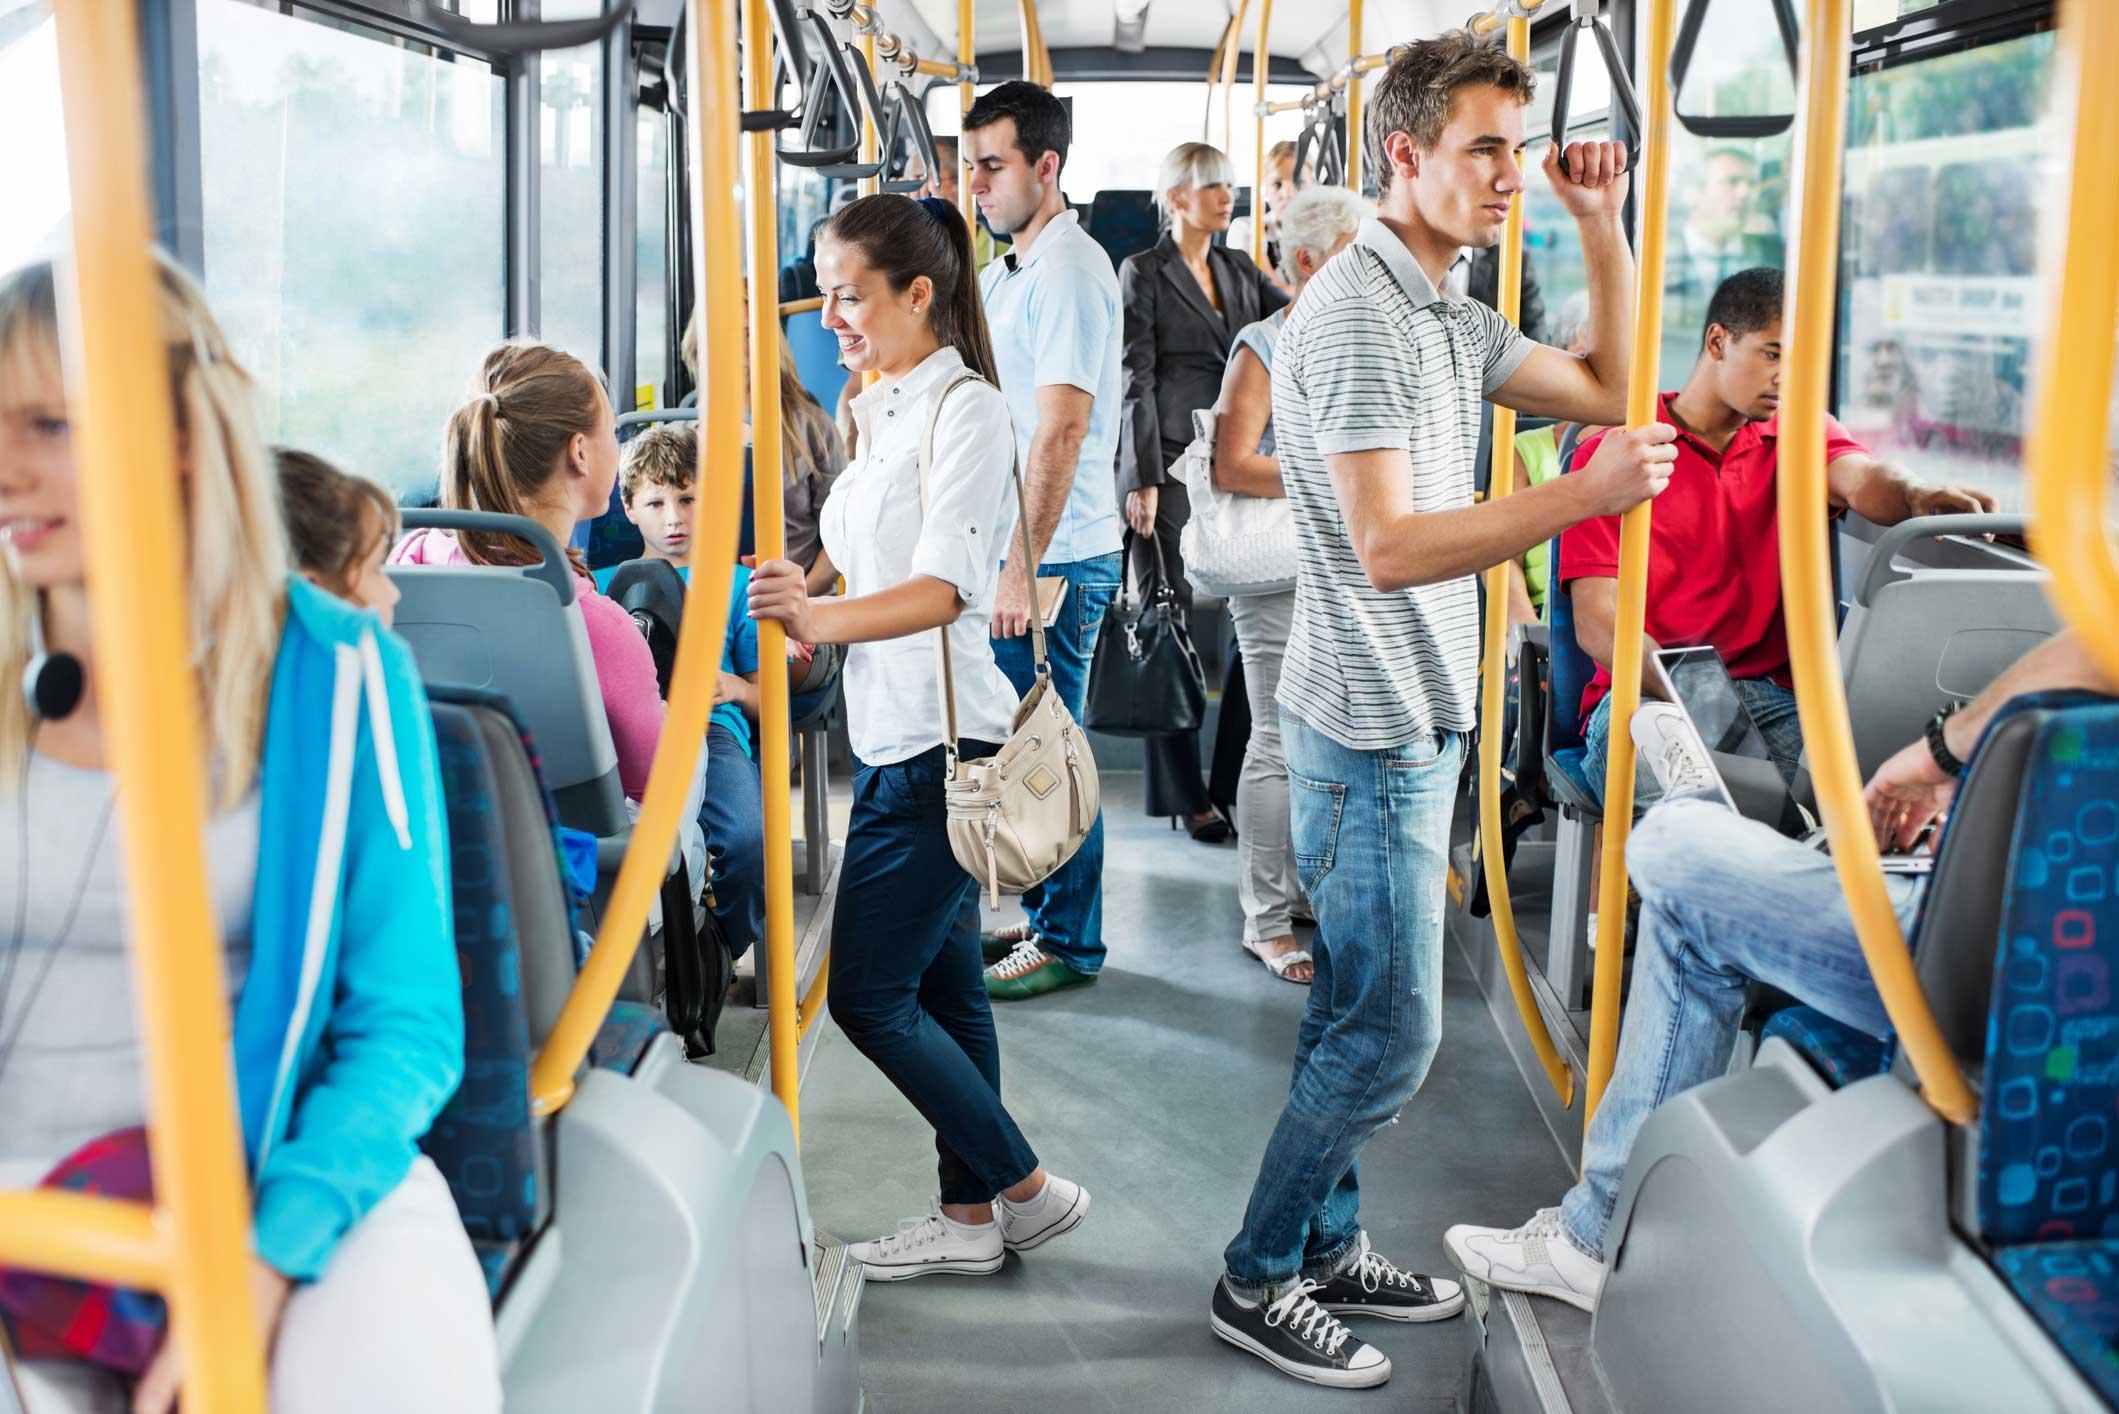 passengers on light rail system